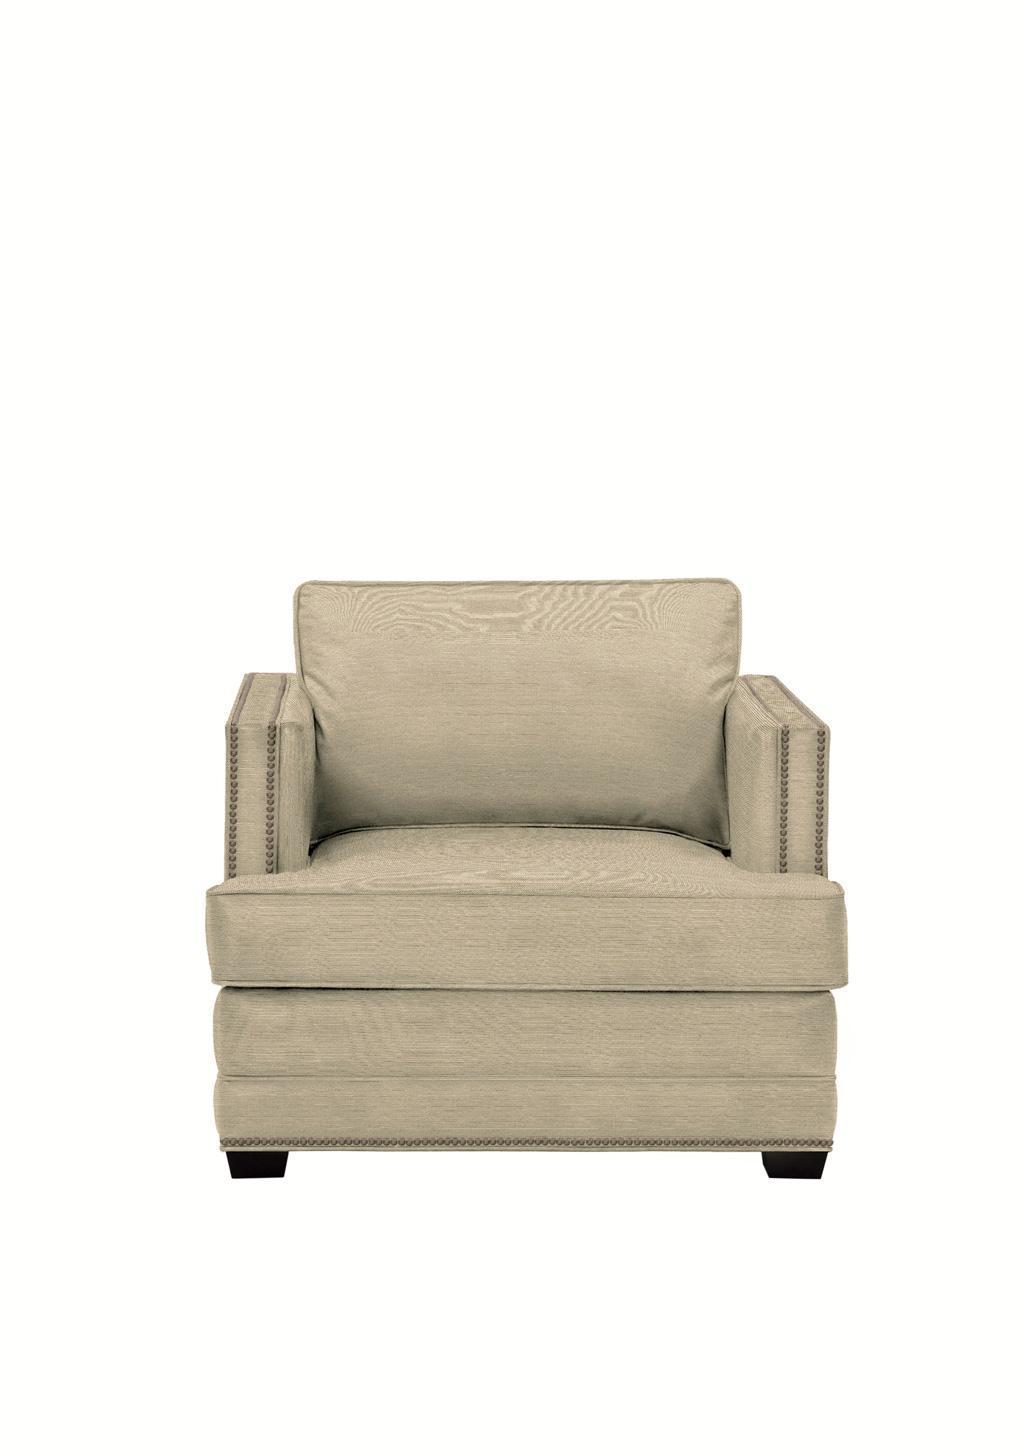 Harbor House DAKOTA单人沙发10186505021018650502